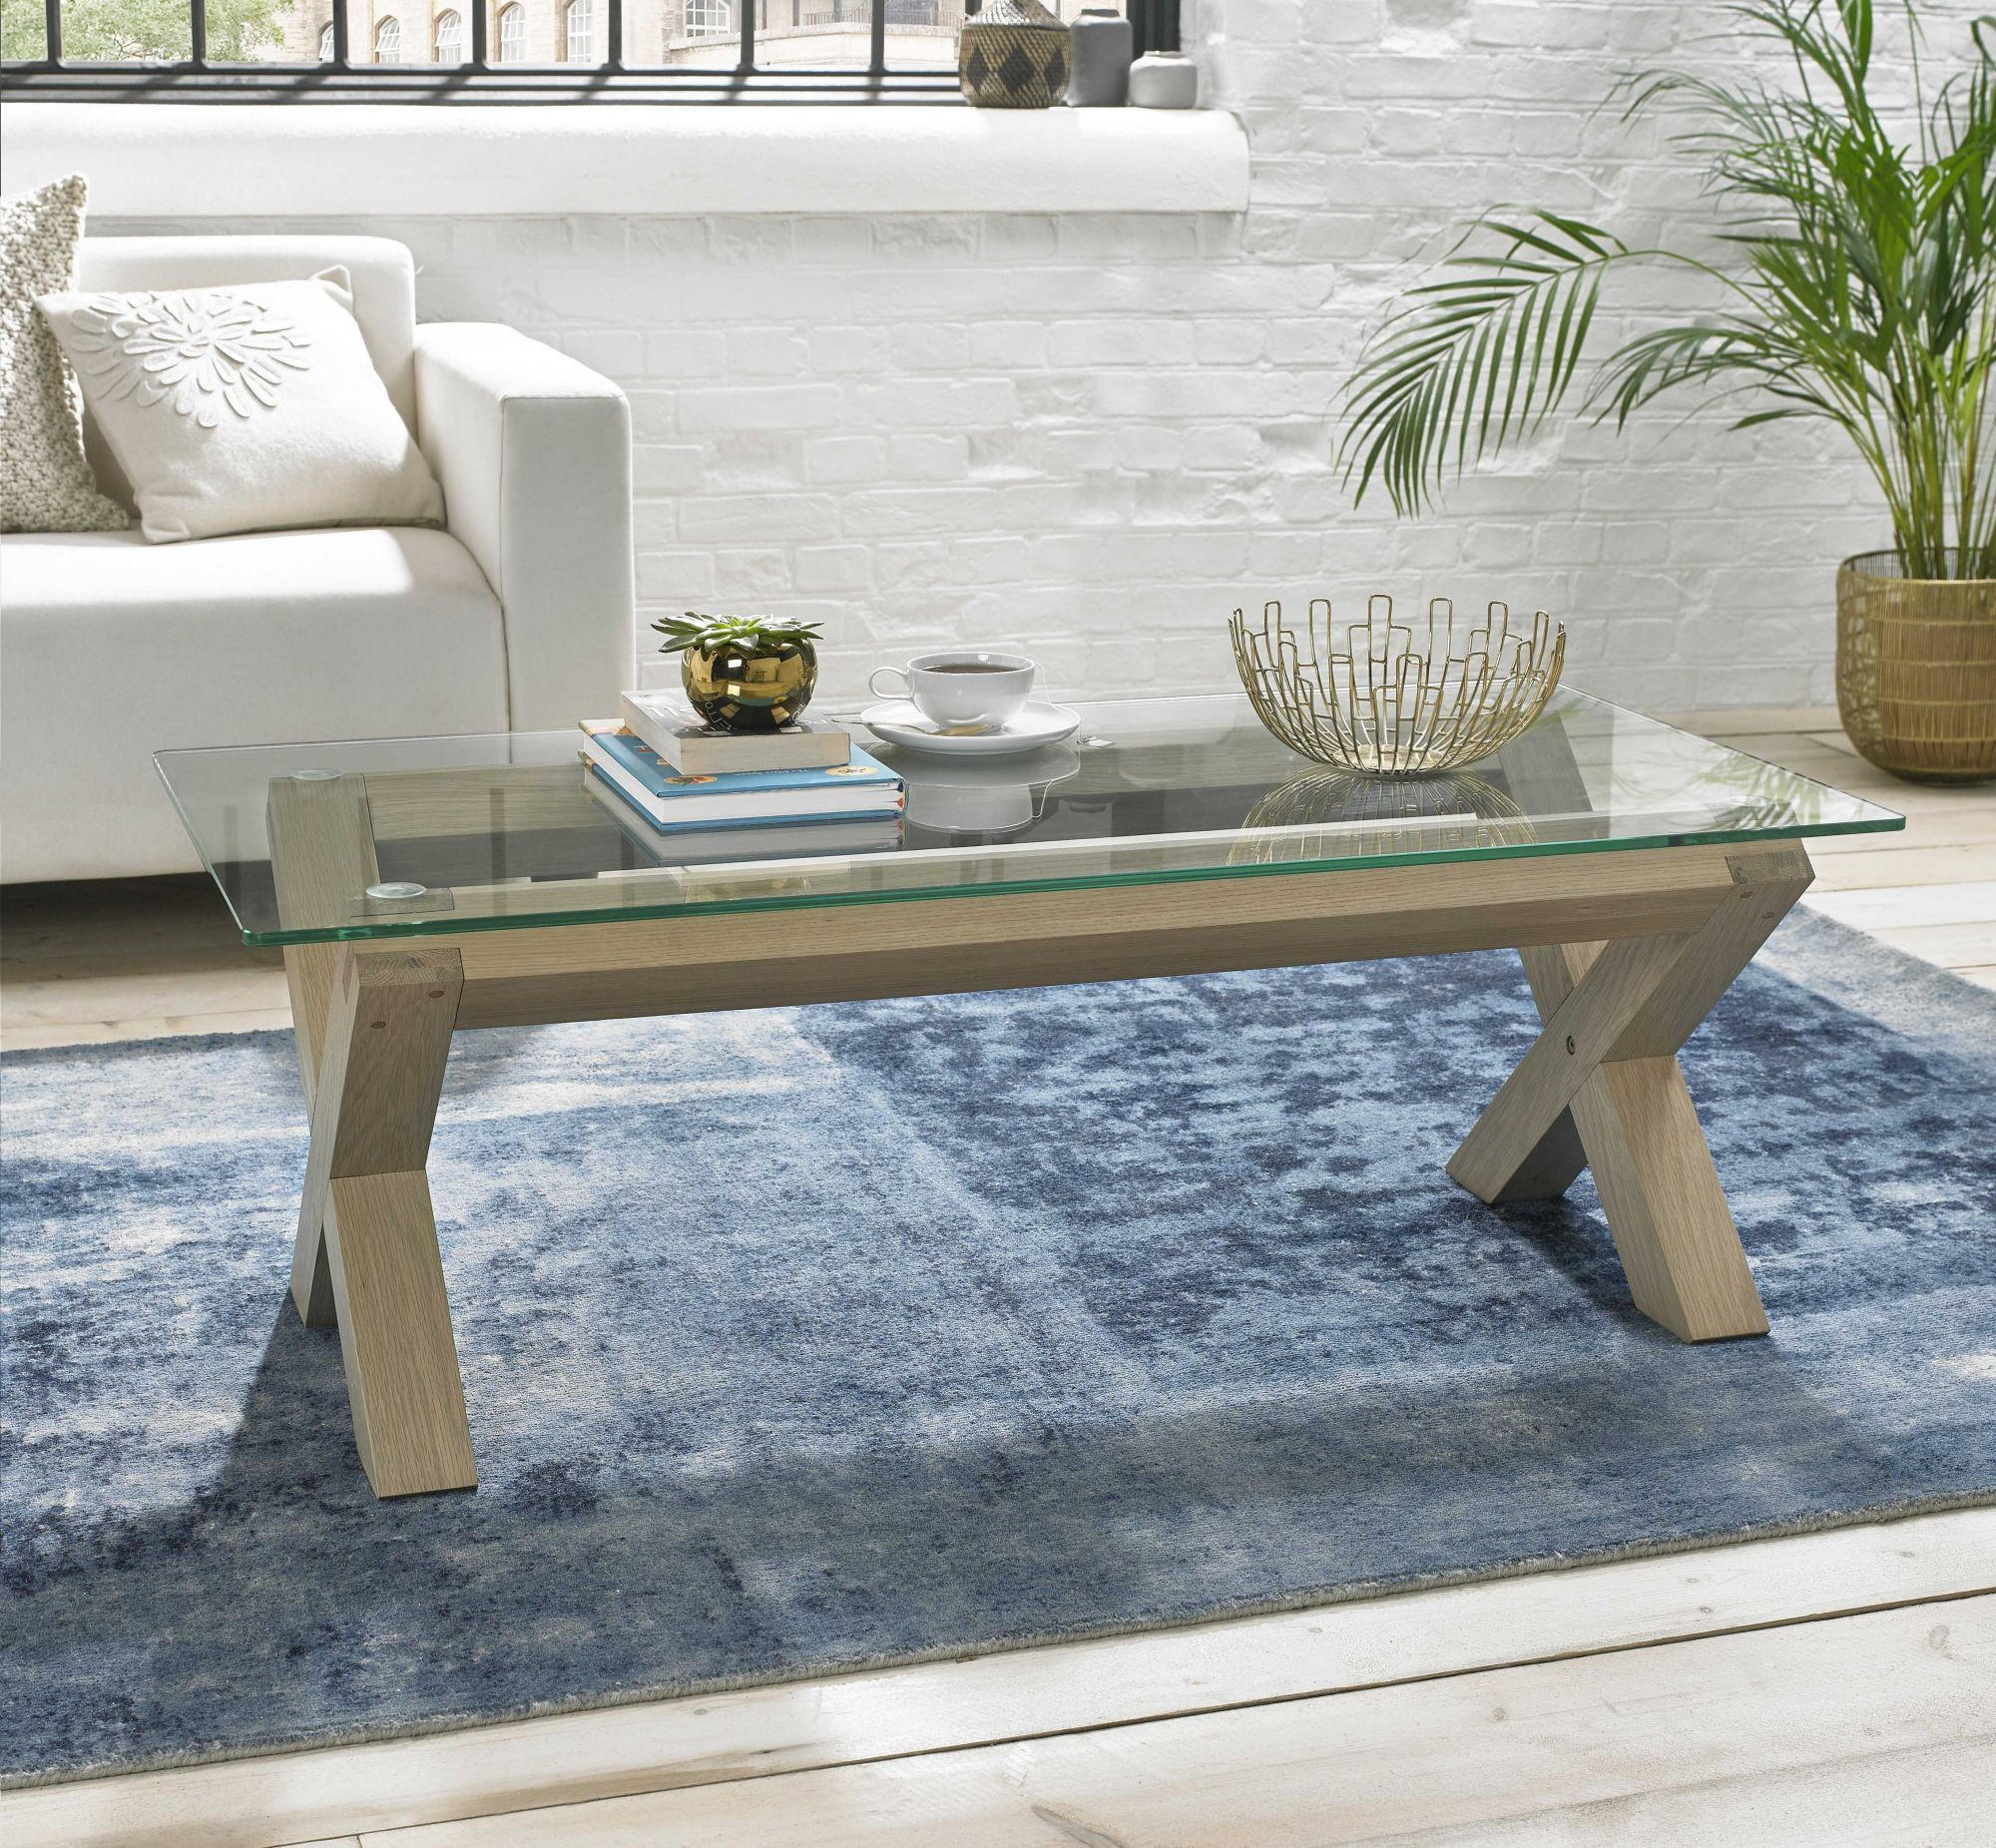 bentley designs turin aged oak coffee table with drawer dimensions w 110cm x d 60cm x h 40cm material rustic oak veneers wit